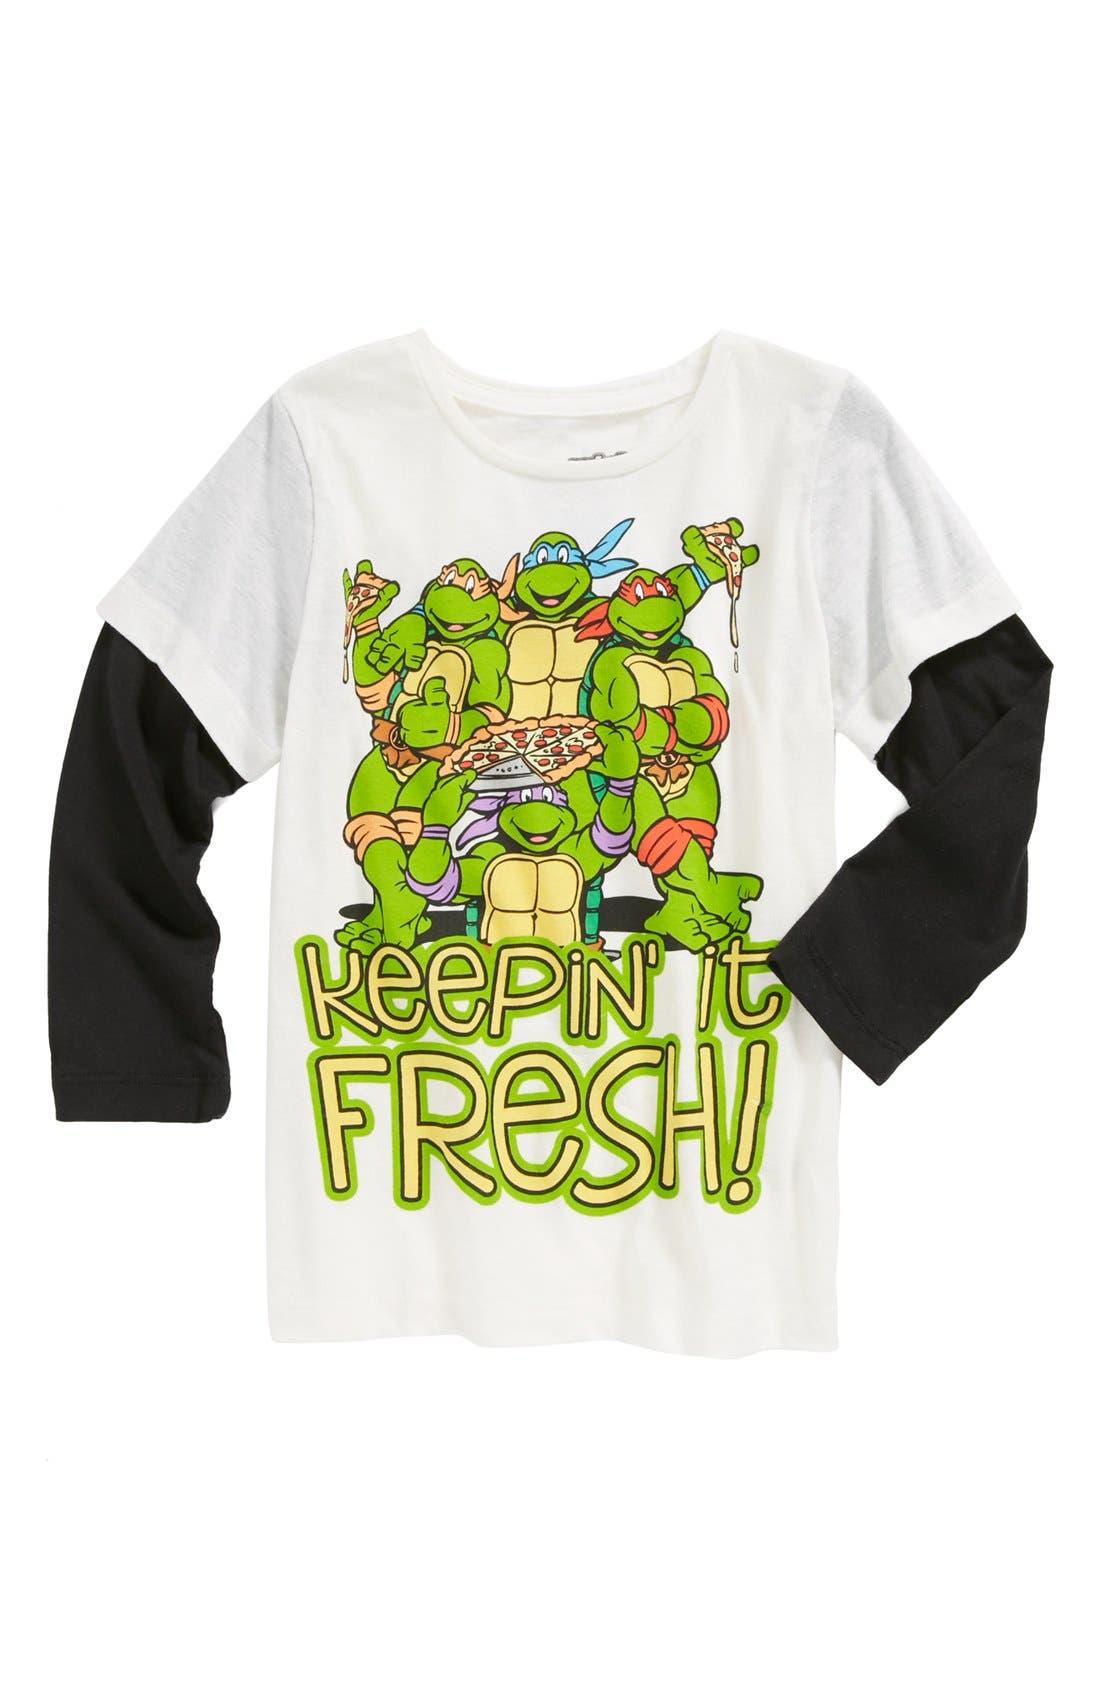 Alternate Image 1 Selected - Mighty Fine 'TMNT Keepin' It Fresh' T-Shirt (Little Boys)